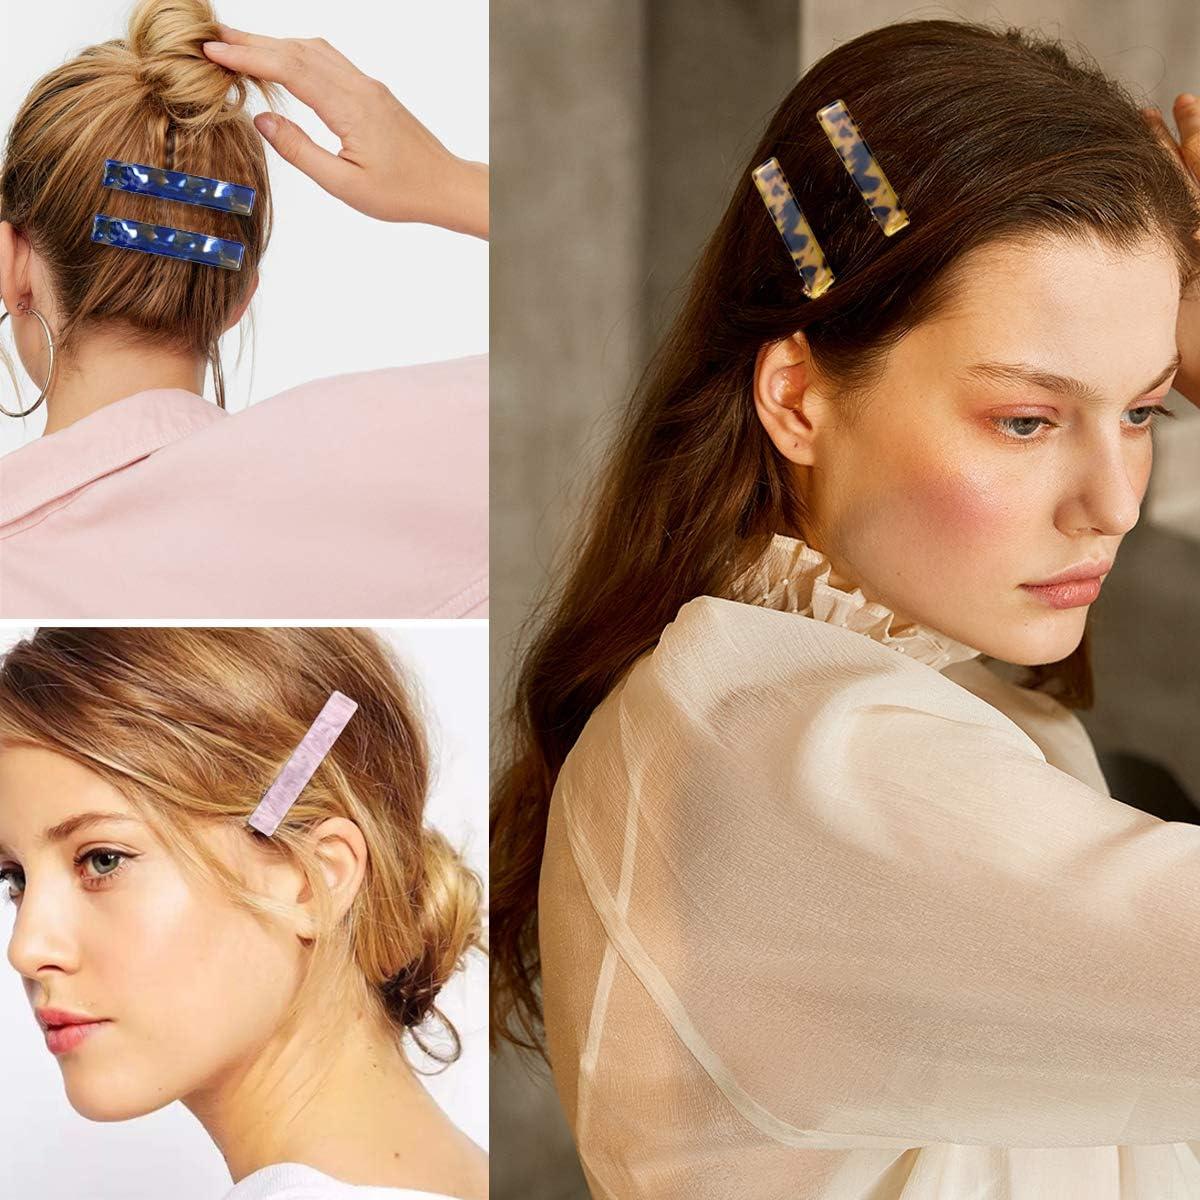 Women/'s Hair Clips Duckbill Clip Acid Jelly Hairpin Slide Hair Accessories